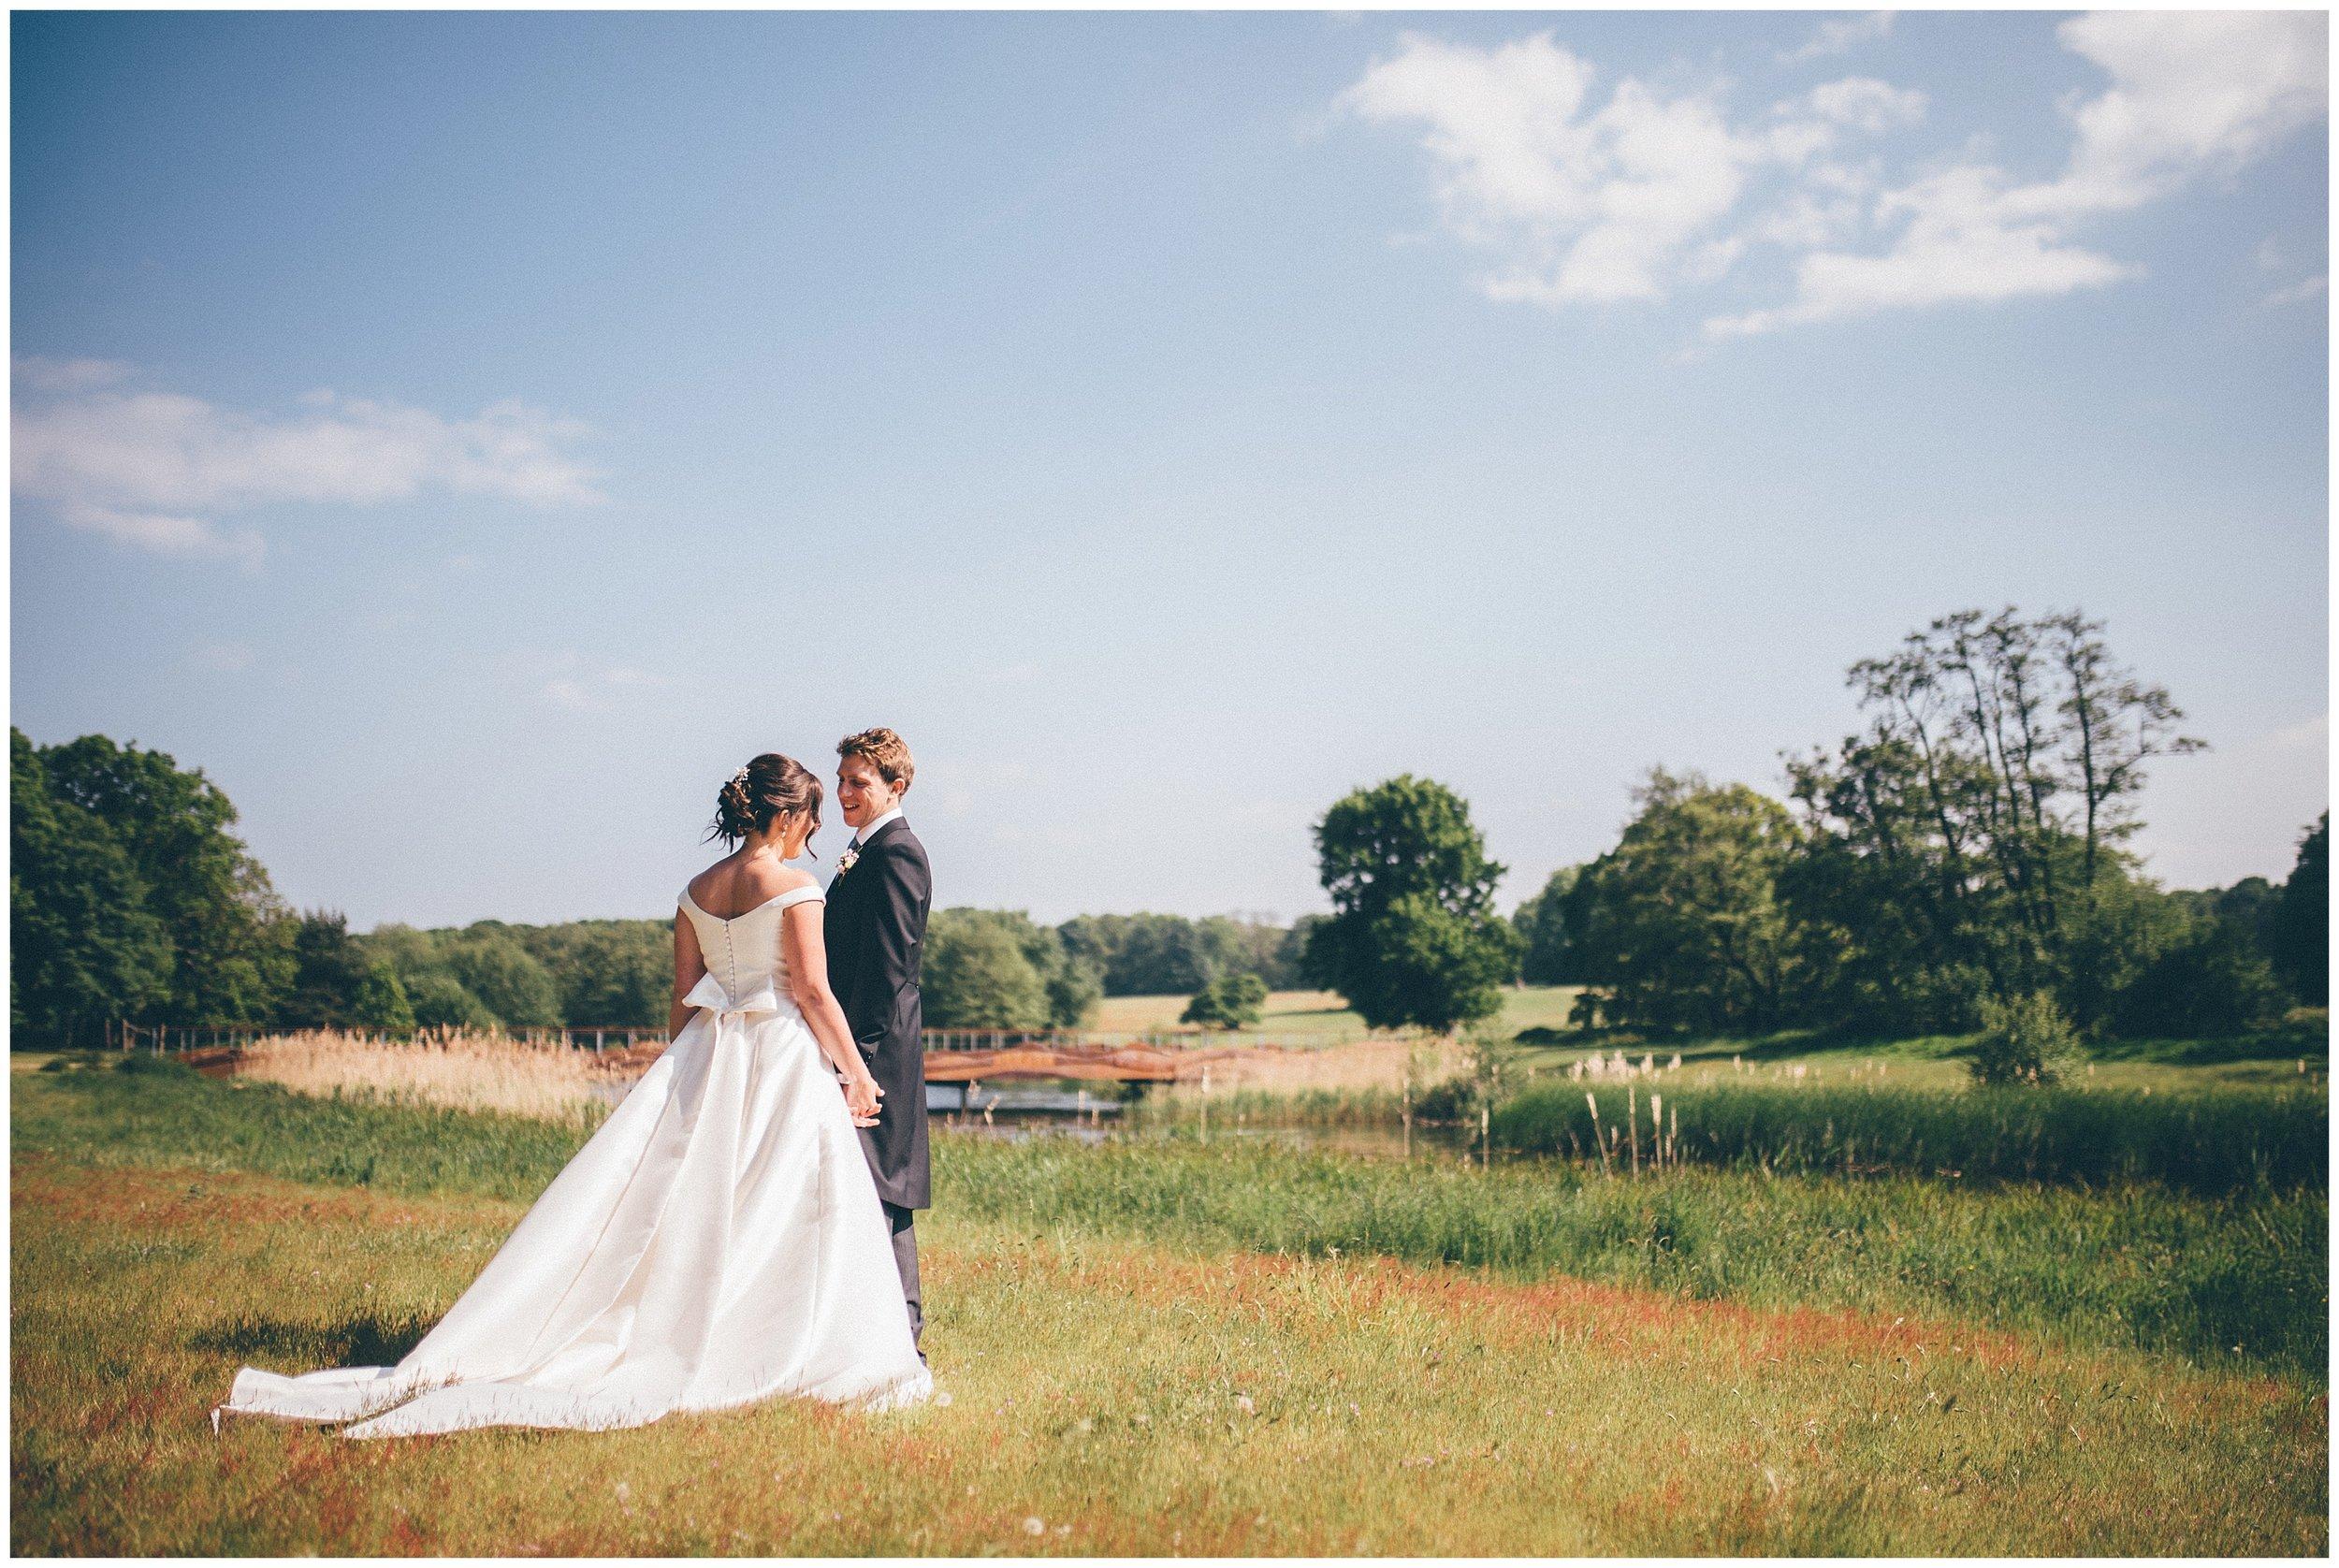 Bride and groom at Henham Park wedding barns.